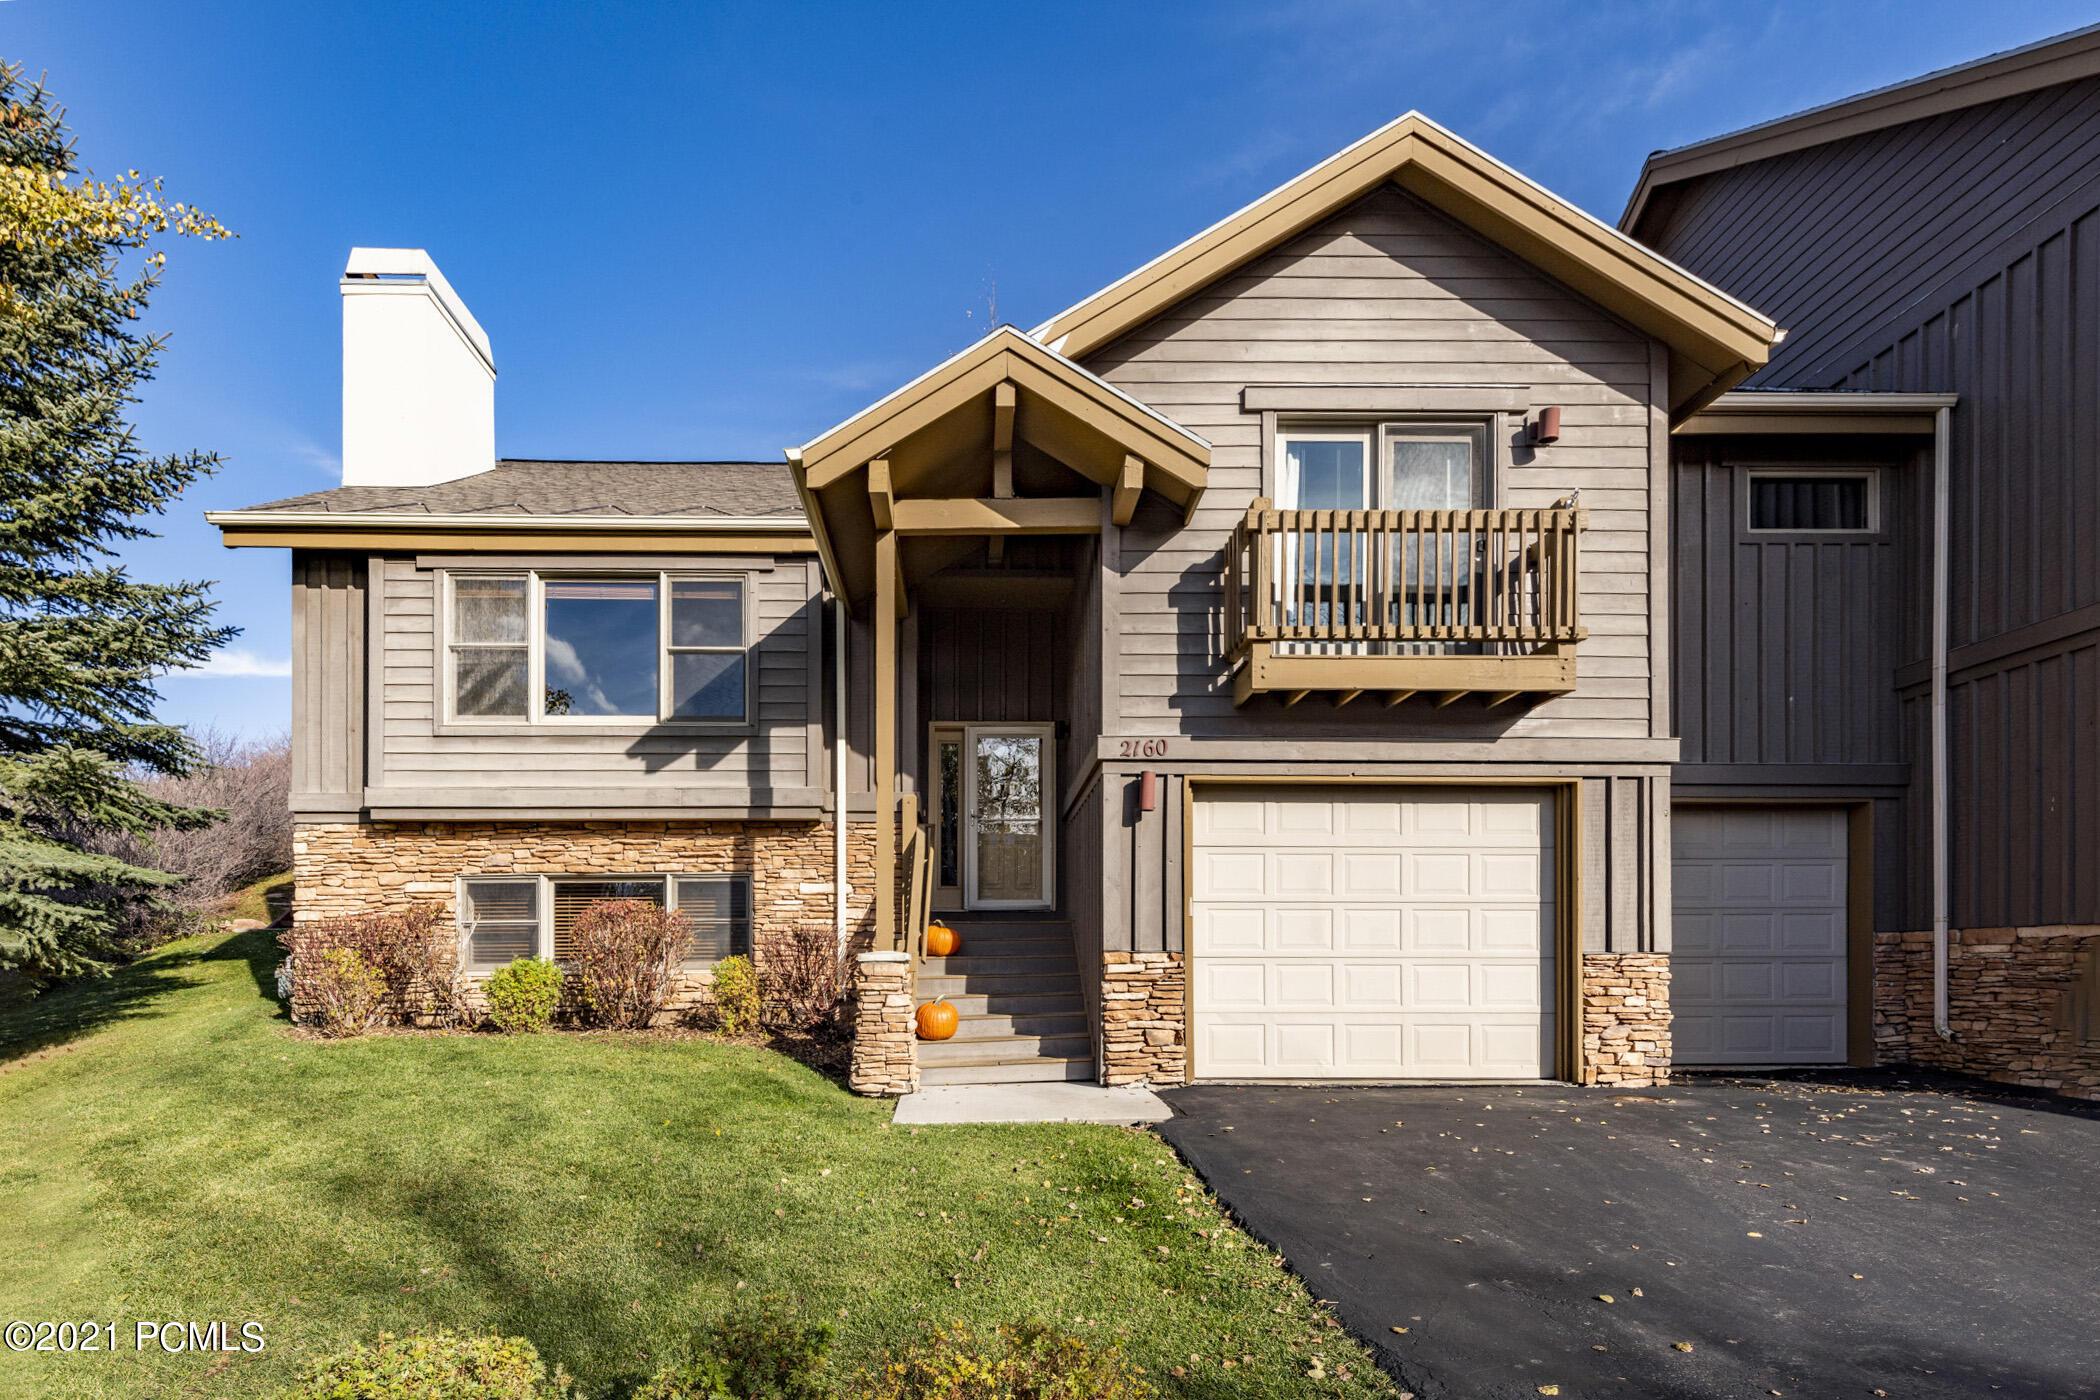 2160 Fenchurch Drive, Park City, Utah 84060, 4 Bedrooms Bedrooms, ,4 BathroomsBathrooms,Condominium,For Sale,Fenchurch,12104248